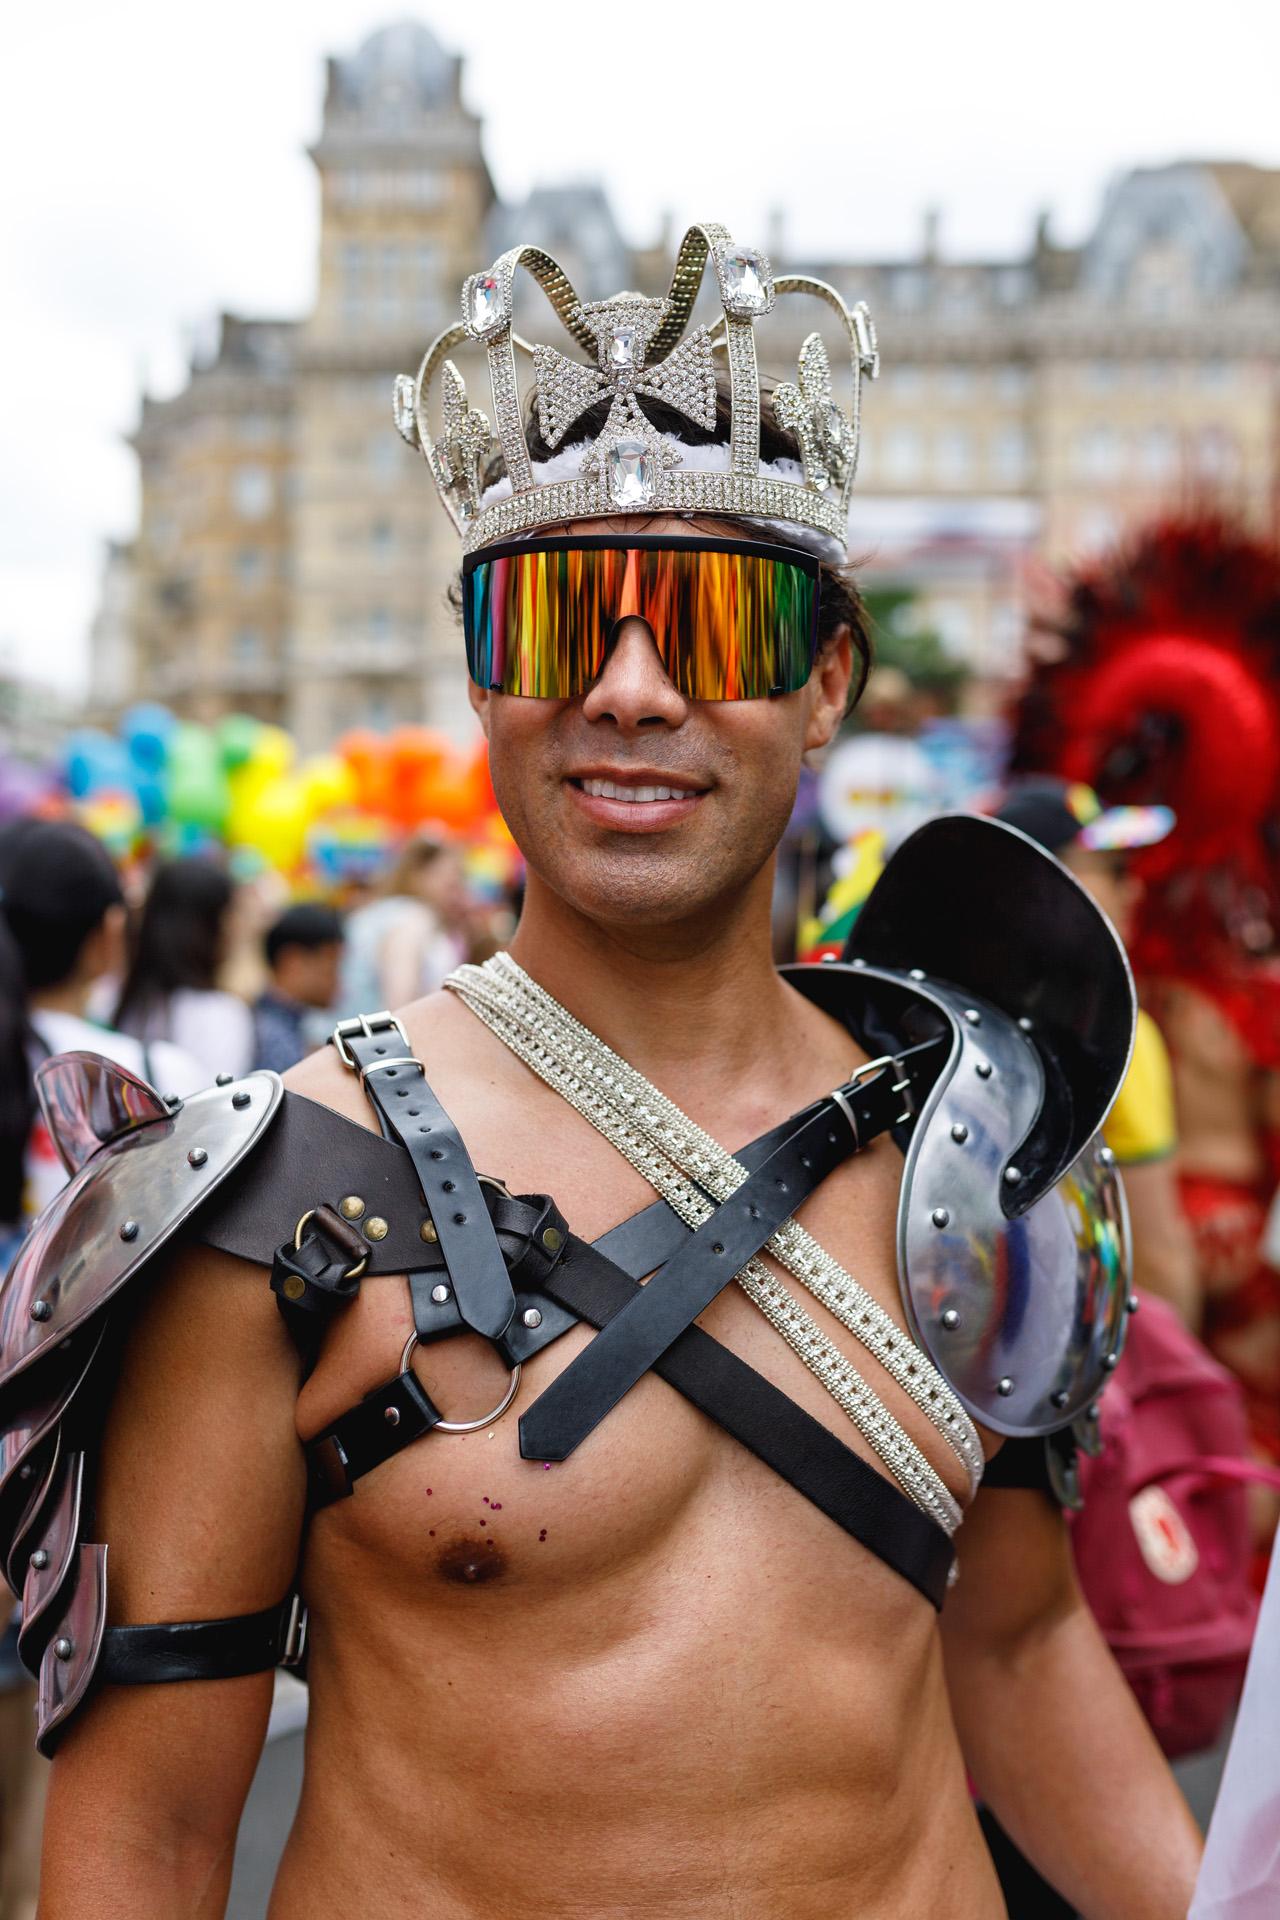 PrideinLondon_edrobertson6.jpg